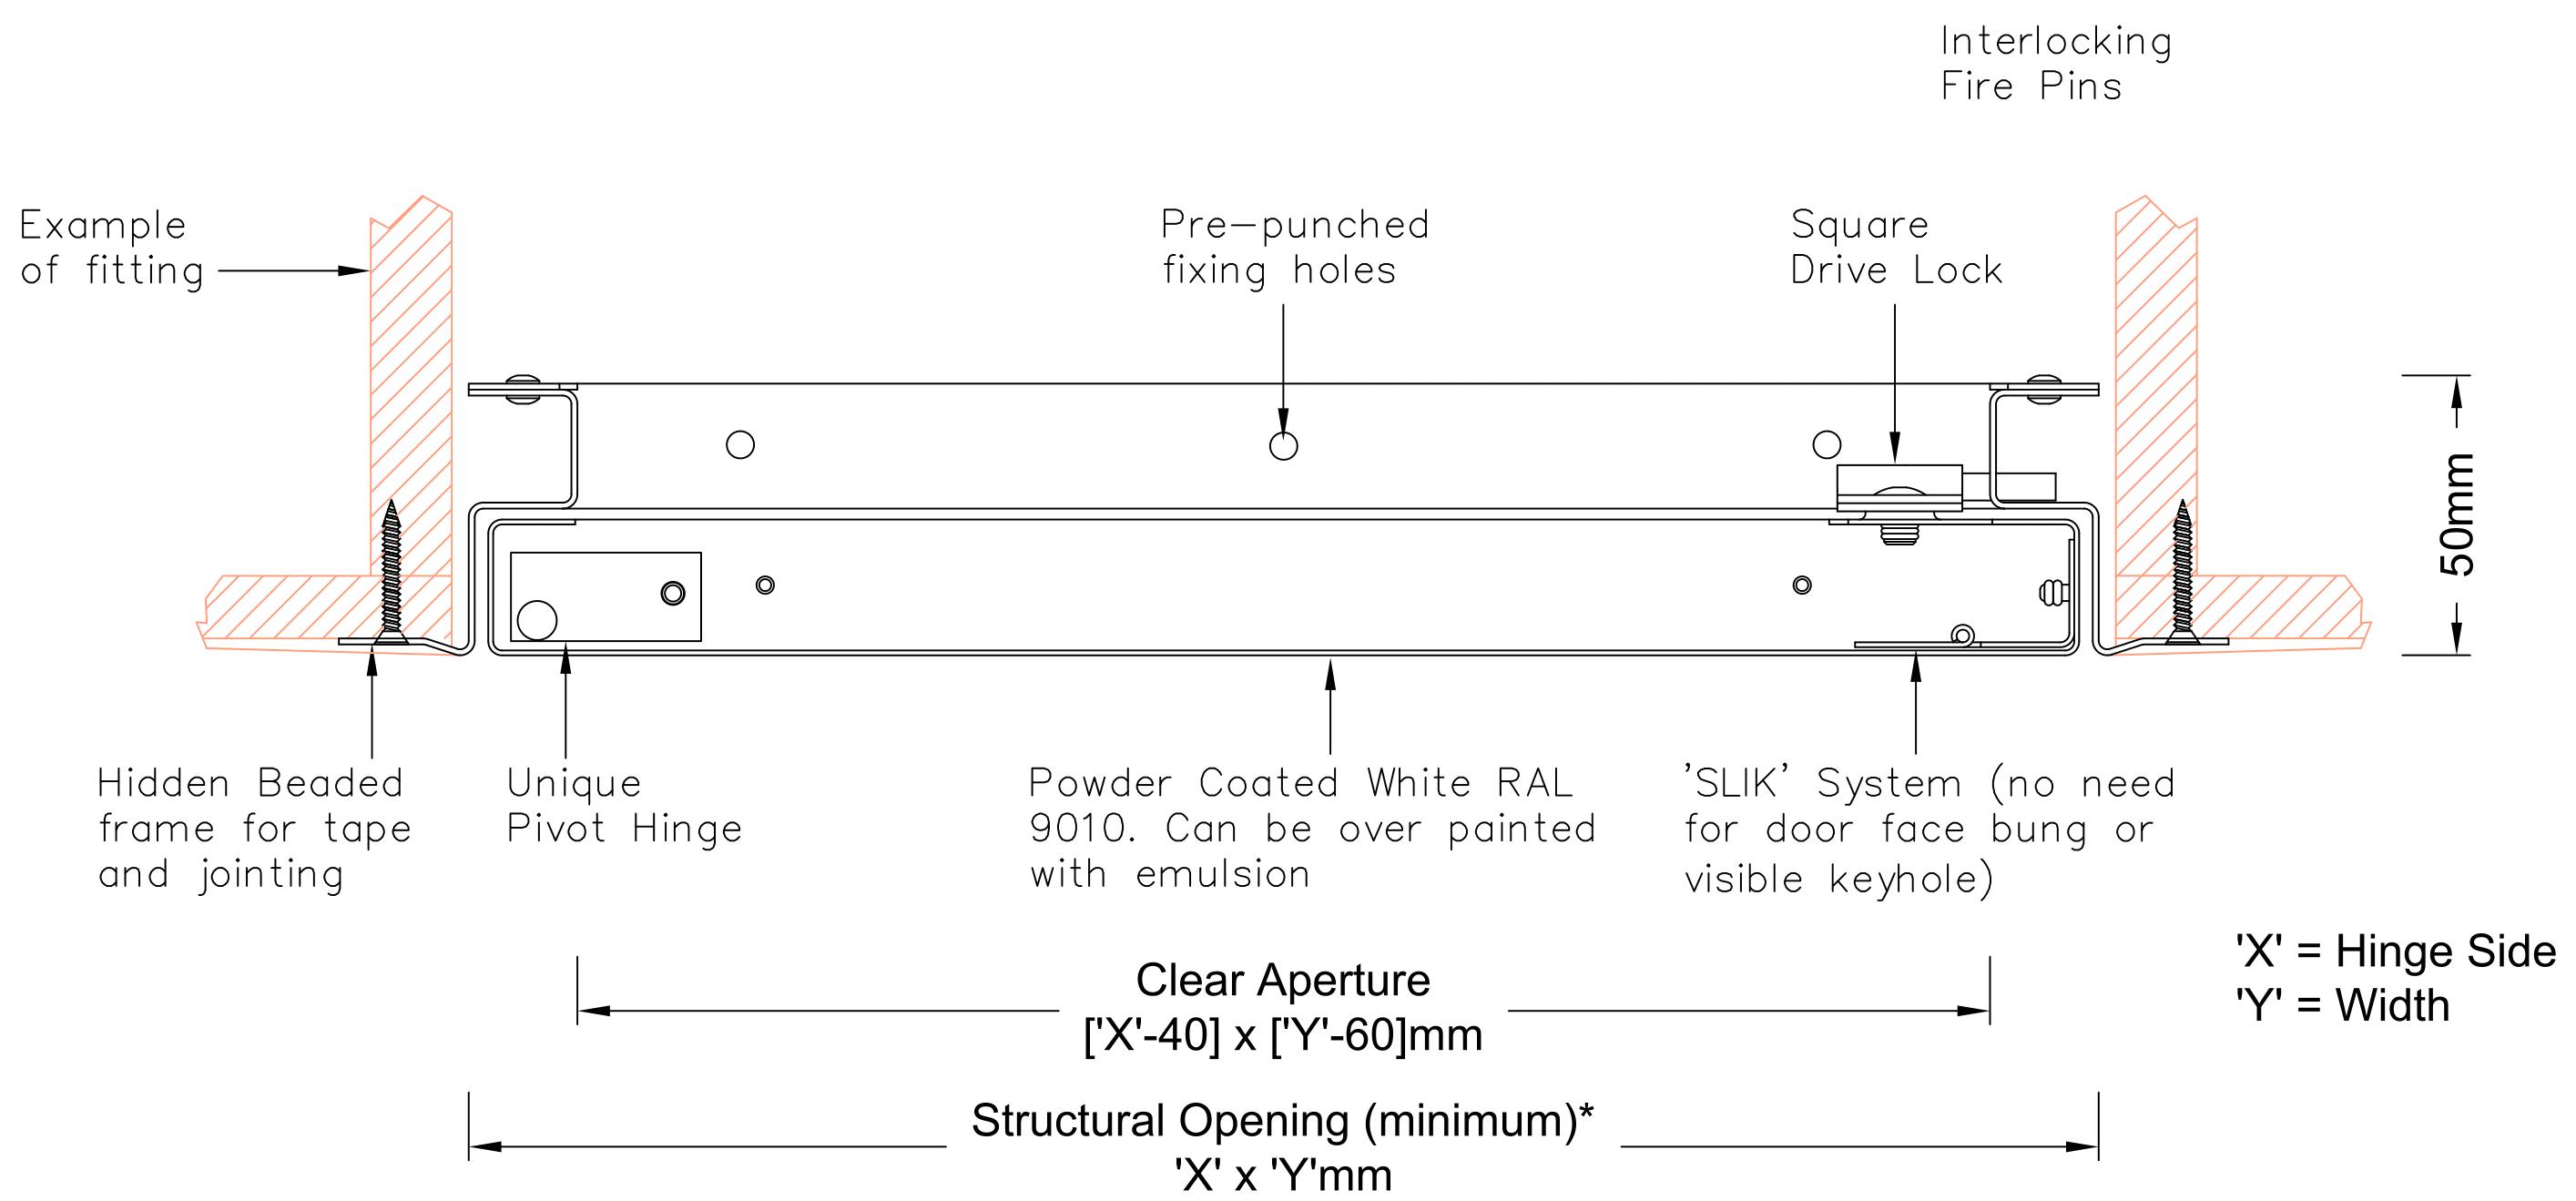 R01-Premium-Non-Fire-Rated-Panel